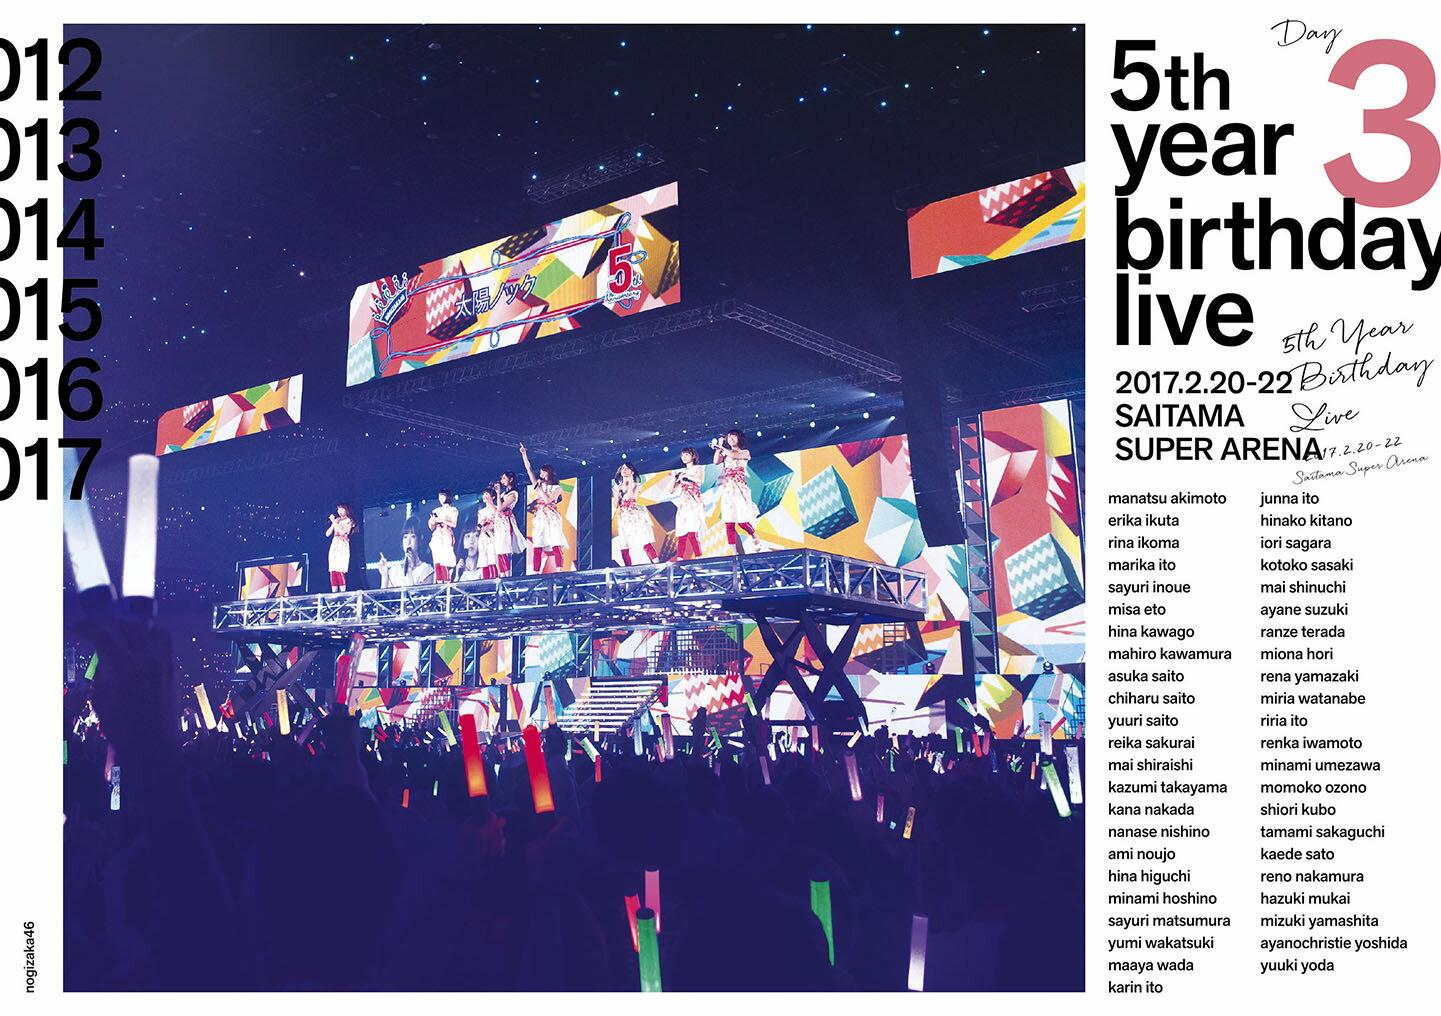 5th YEAR BIRTHDAY LIVE 2017.2.20-22 SAITAMA SUPER ARENA DAY3 [ 乃木坂46 ]